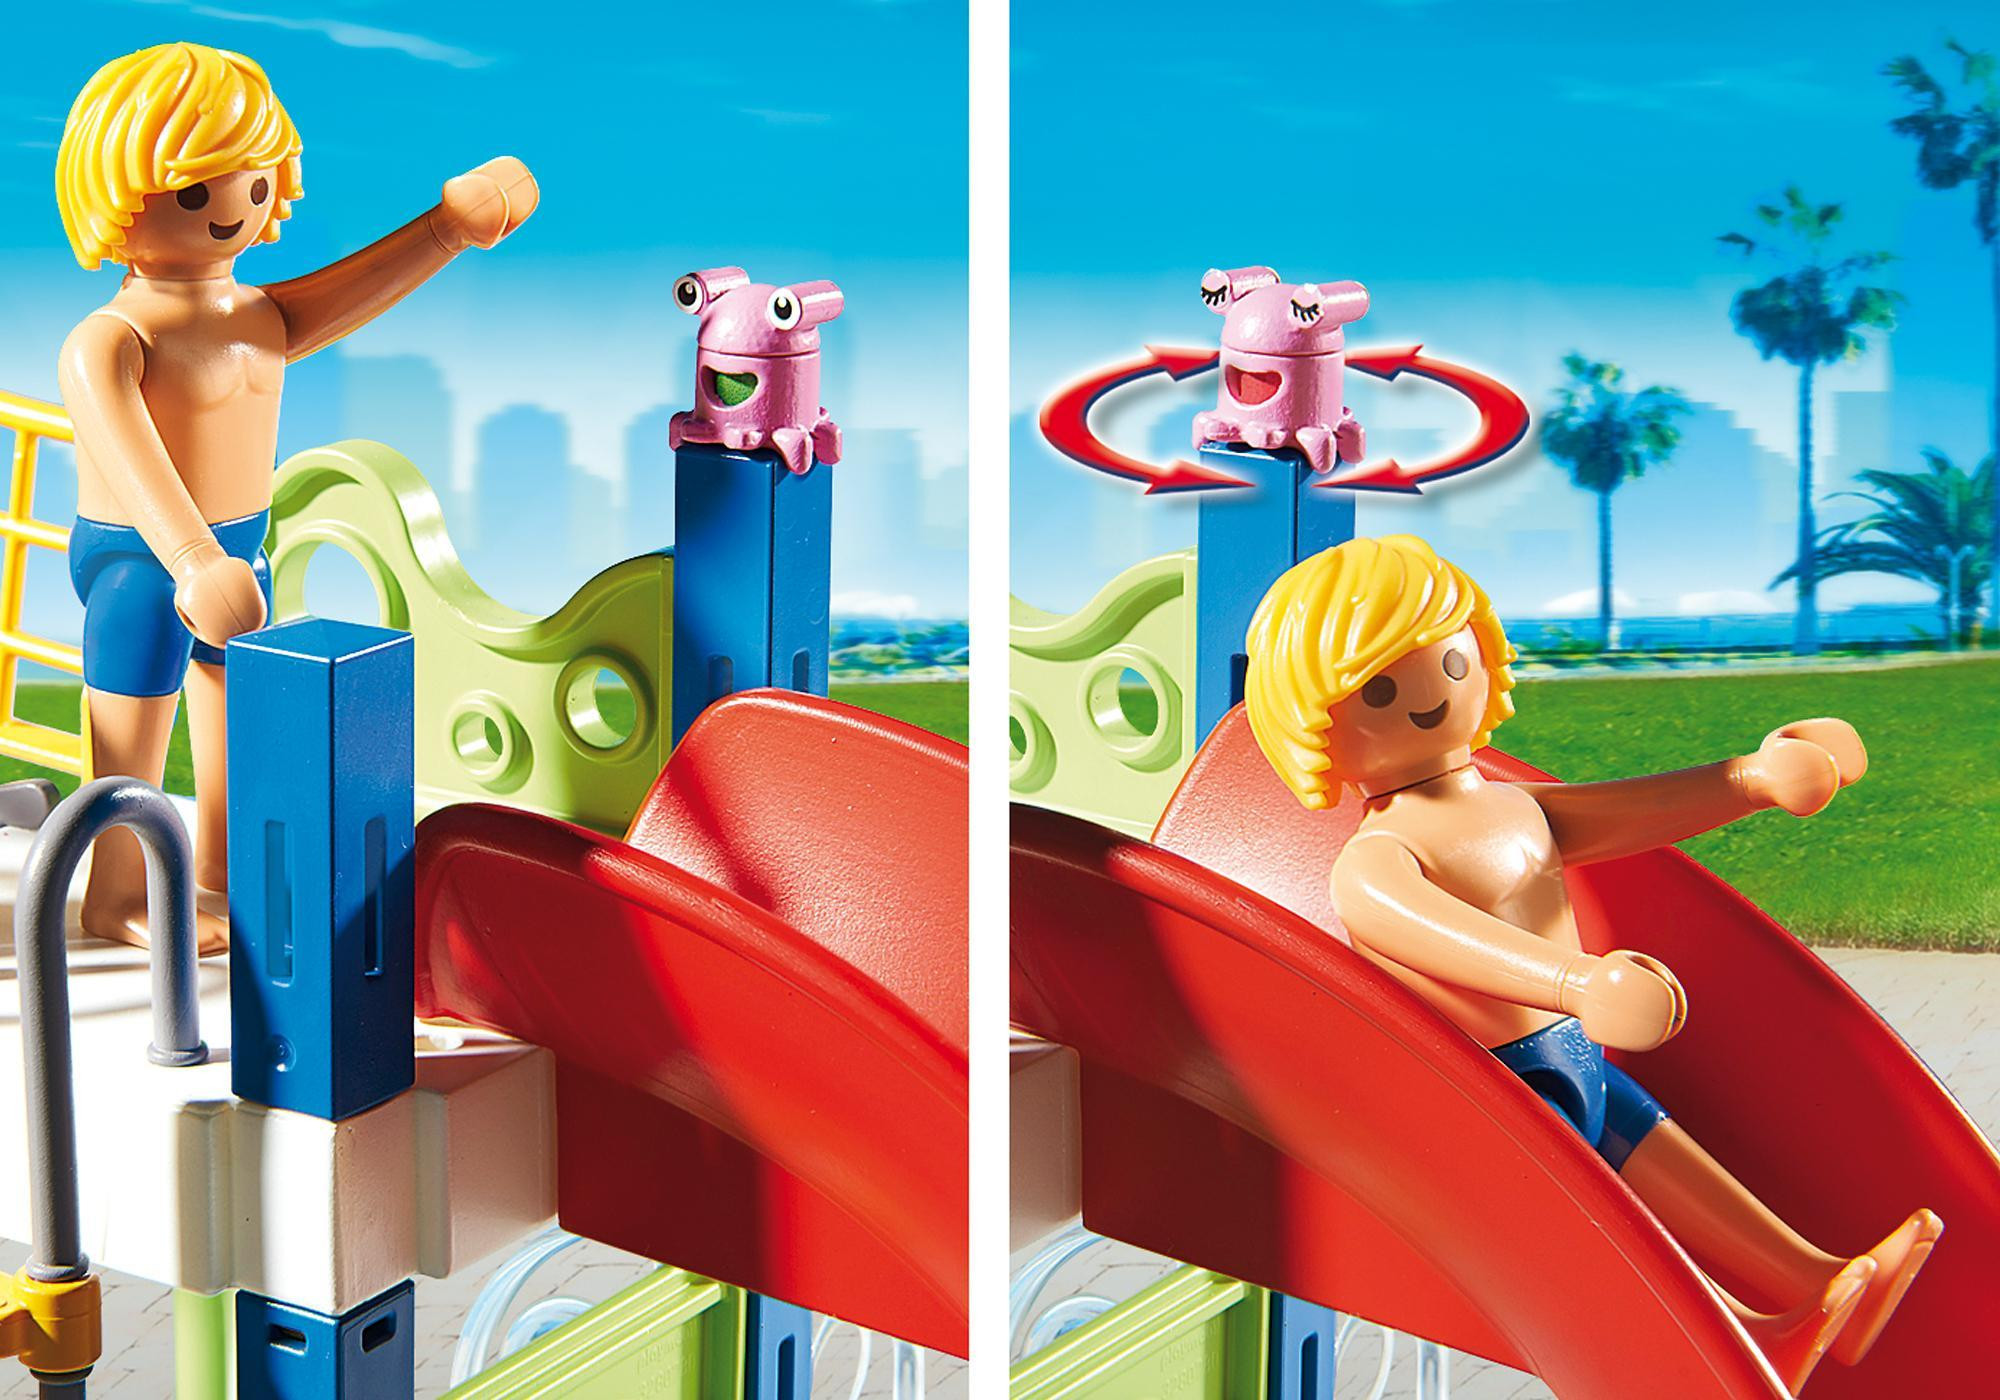 http://media.playmobil.com/i/playmobil/6670_product_extra2/Wodny plac zabaw